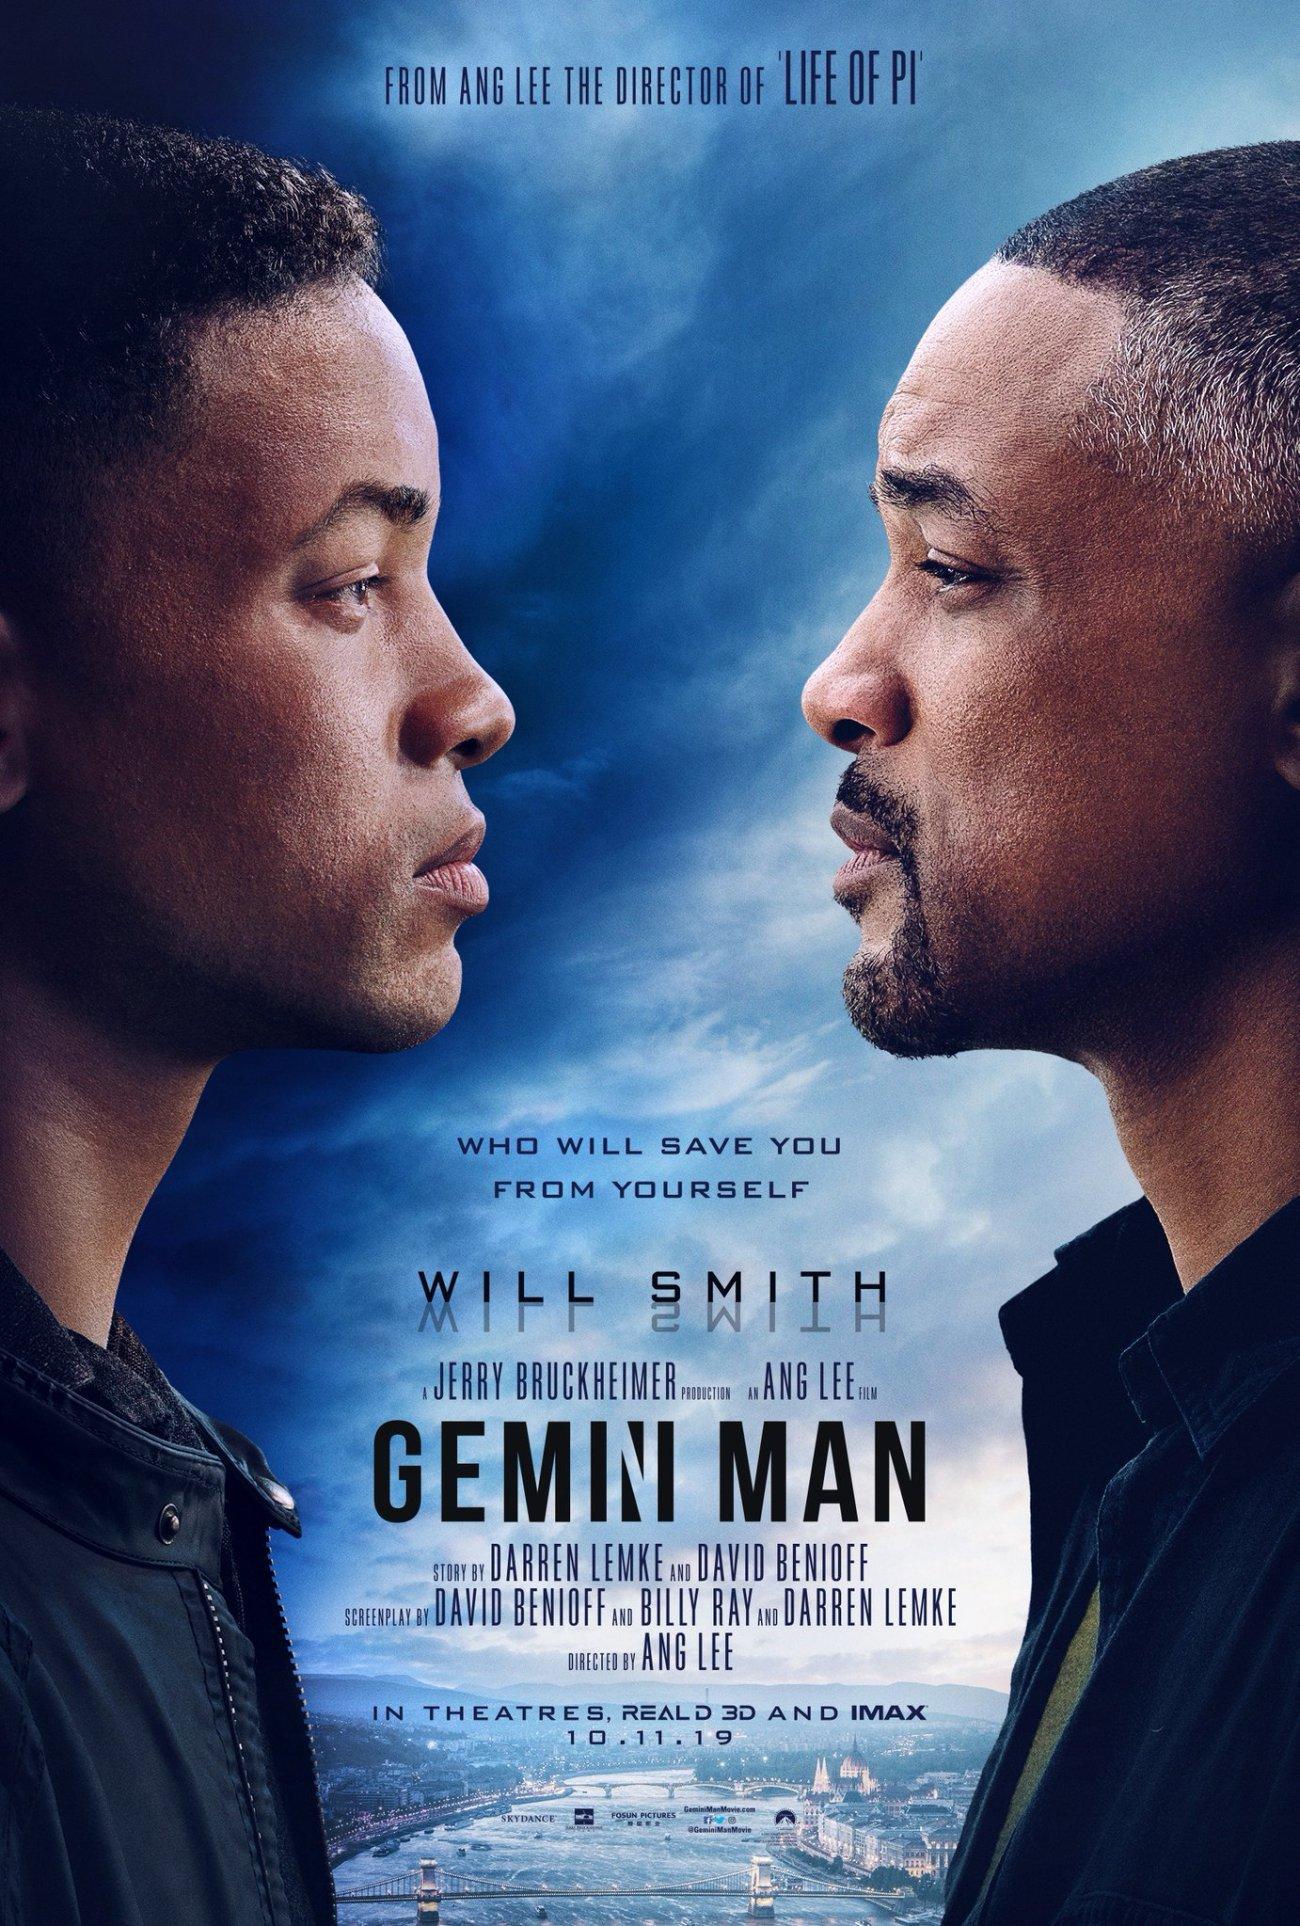 Póster de Gemini Man (2019). Imagen: Gemini Man Twitter (@GeminiManMovie).